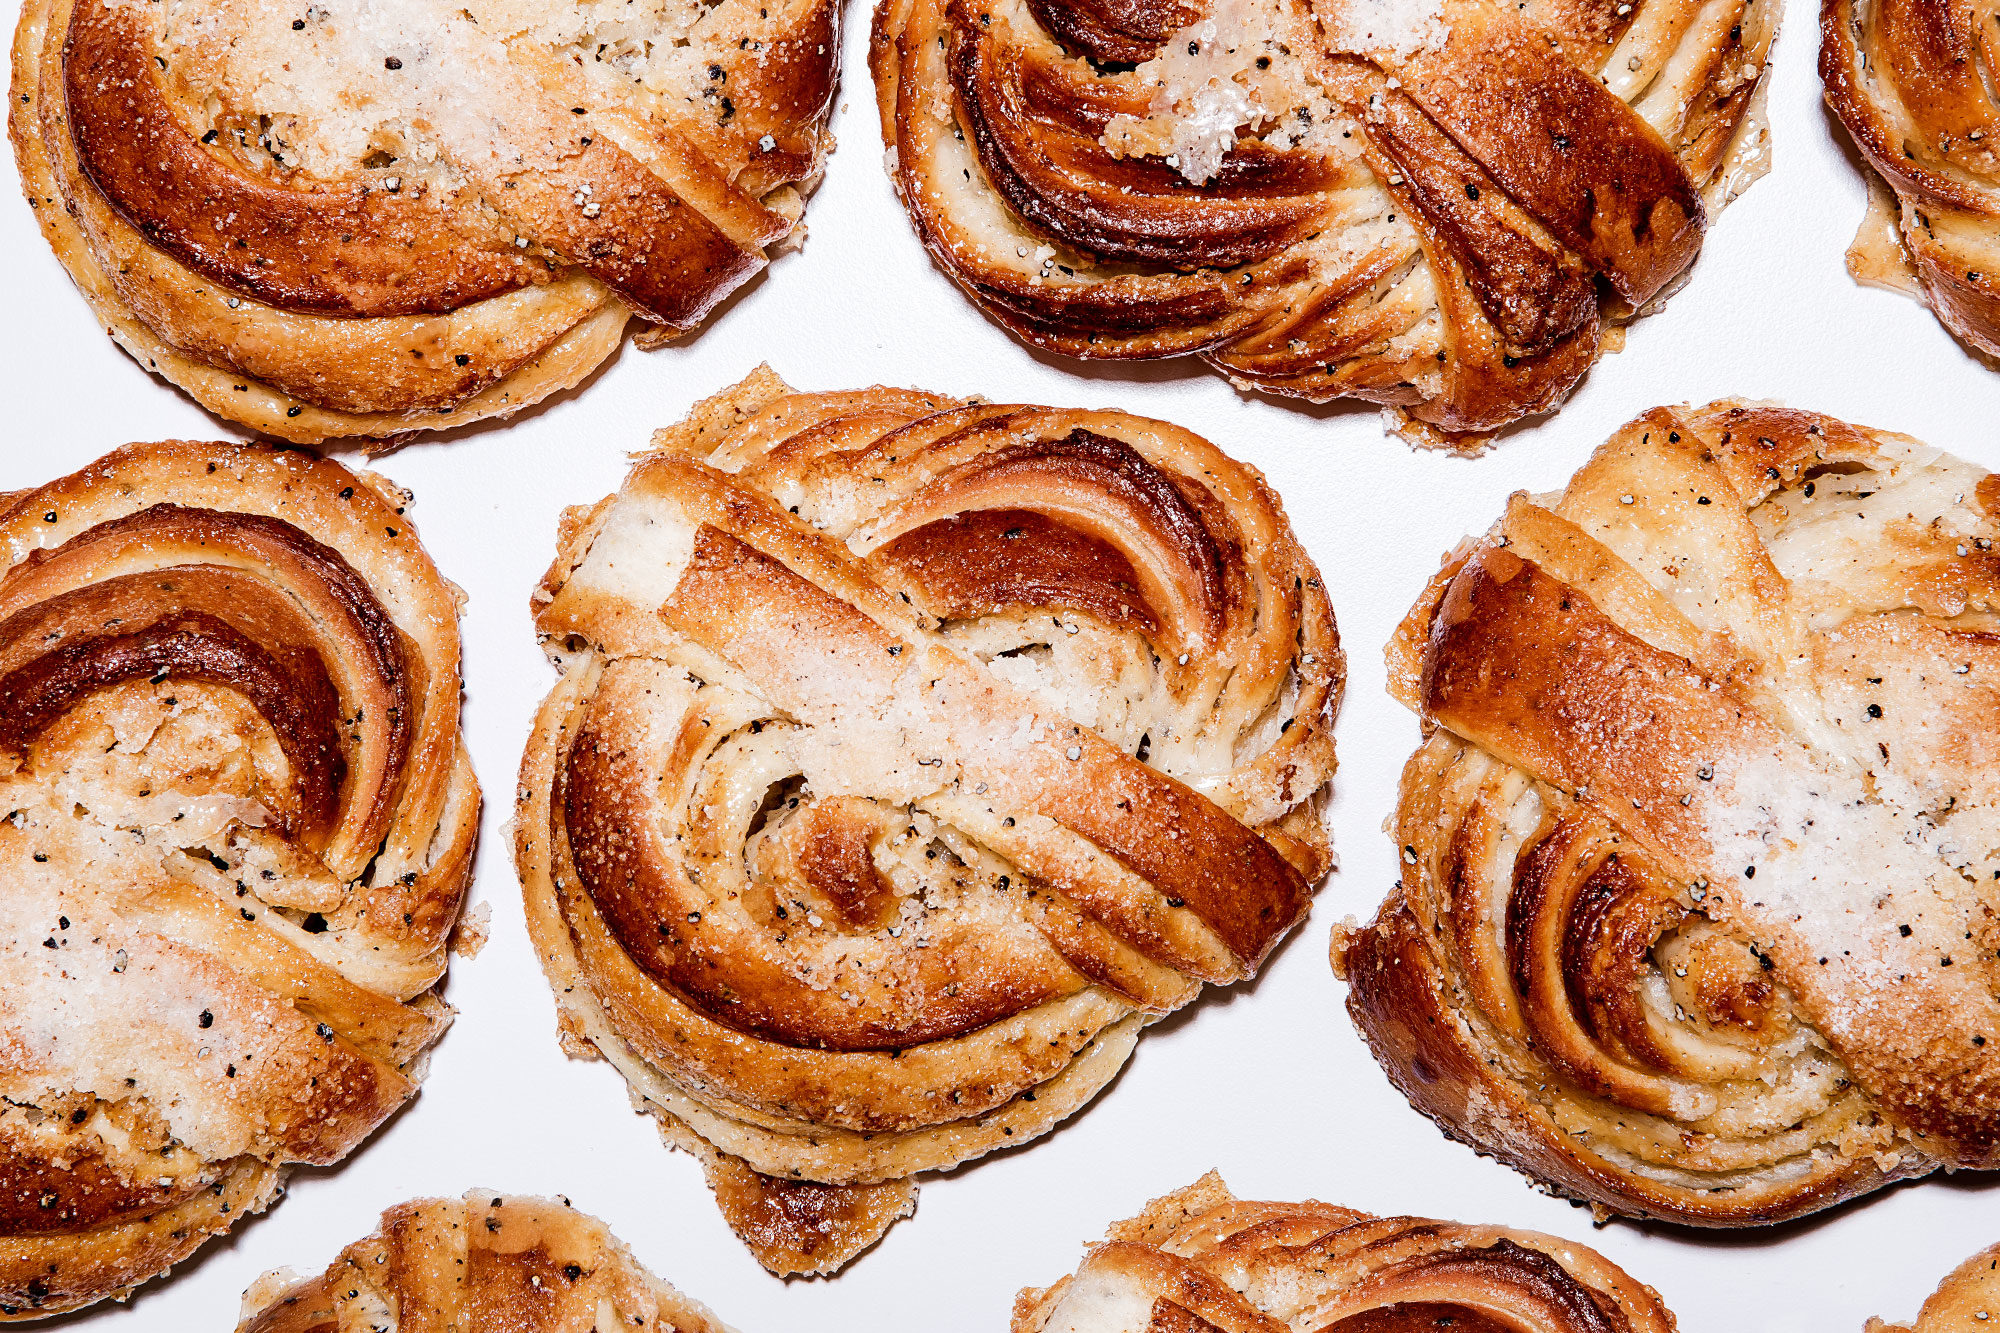 Article-Cardamom-Bun-Swedish-Danish-Pastry-Recipe-Fabrique-NYC